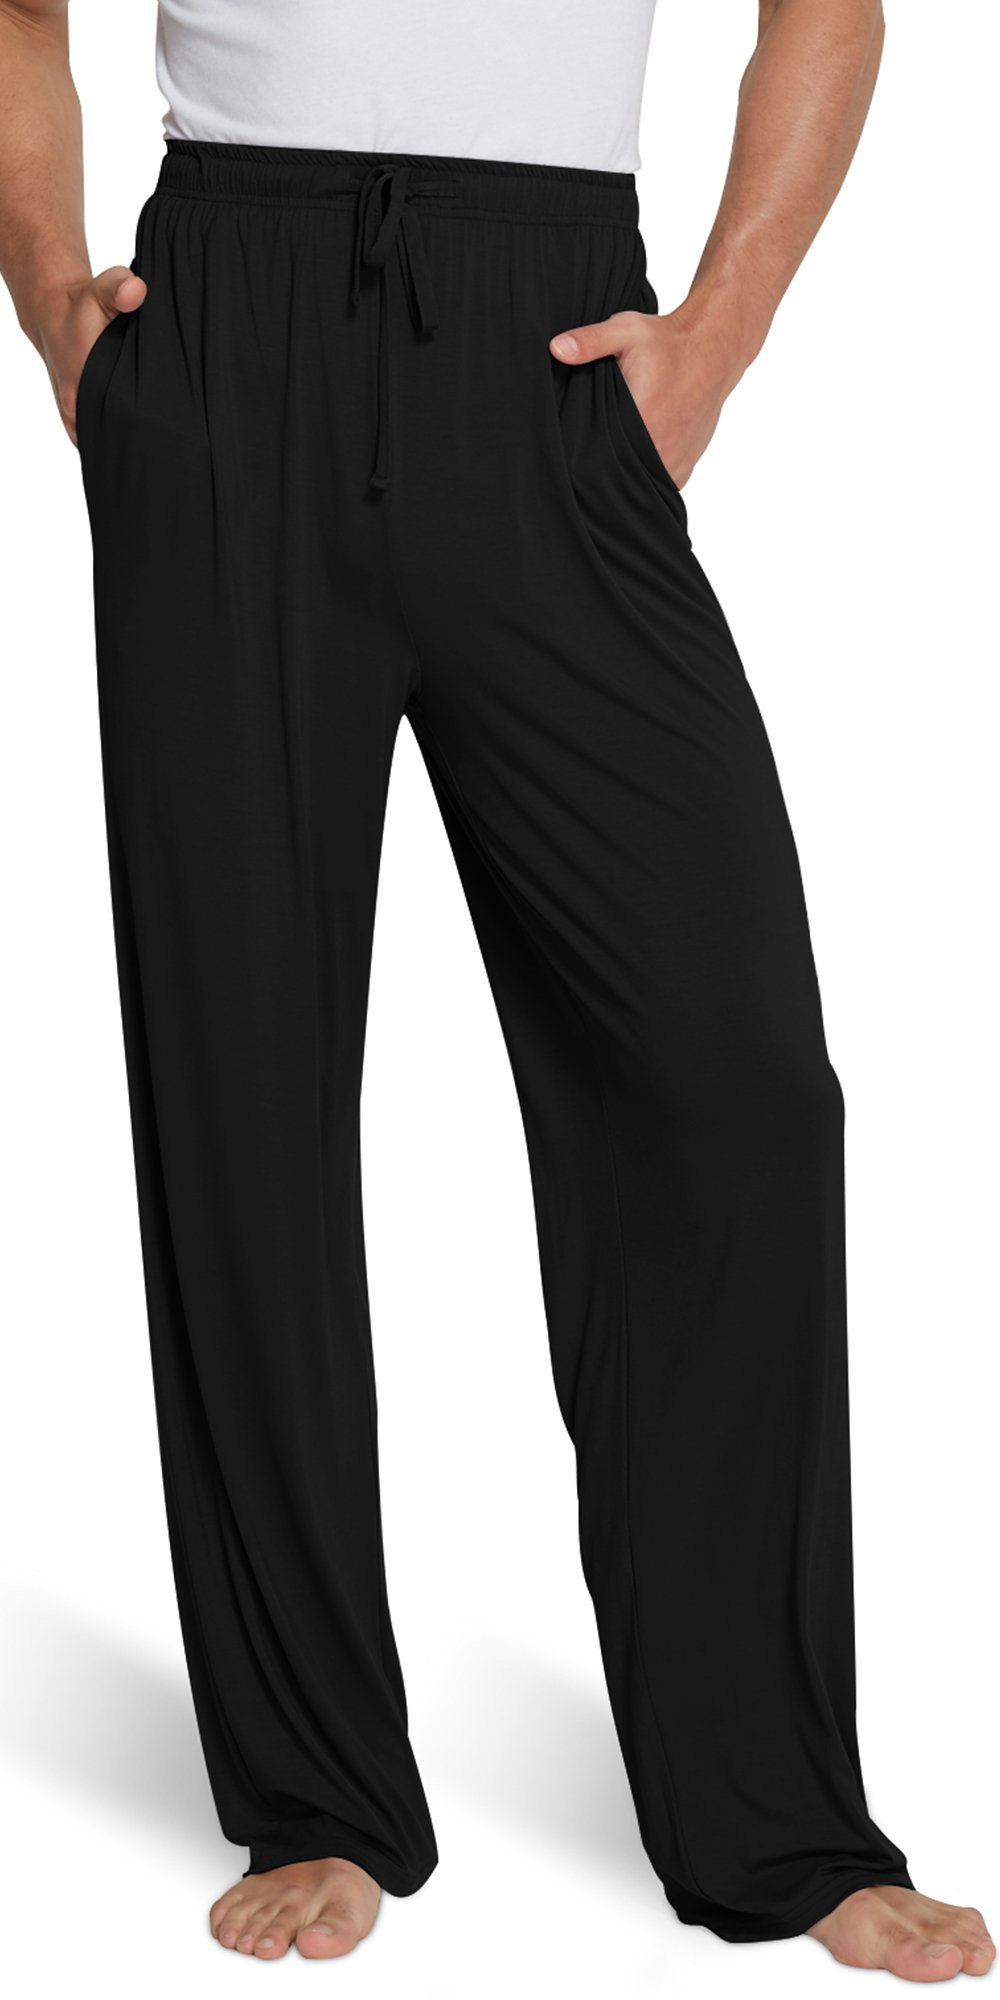 GYS Men's Extra Long Bamboo Sleep Pants, Black, Large